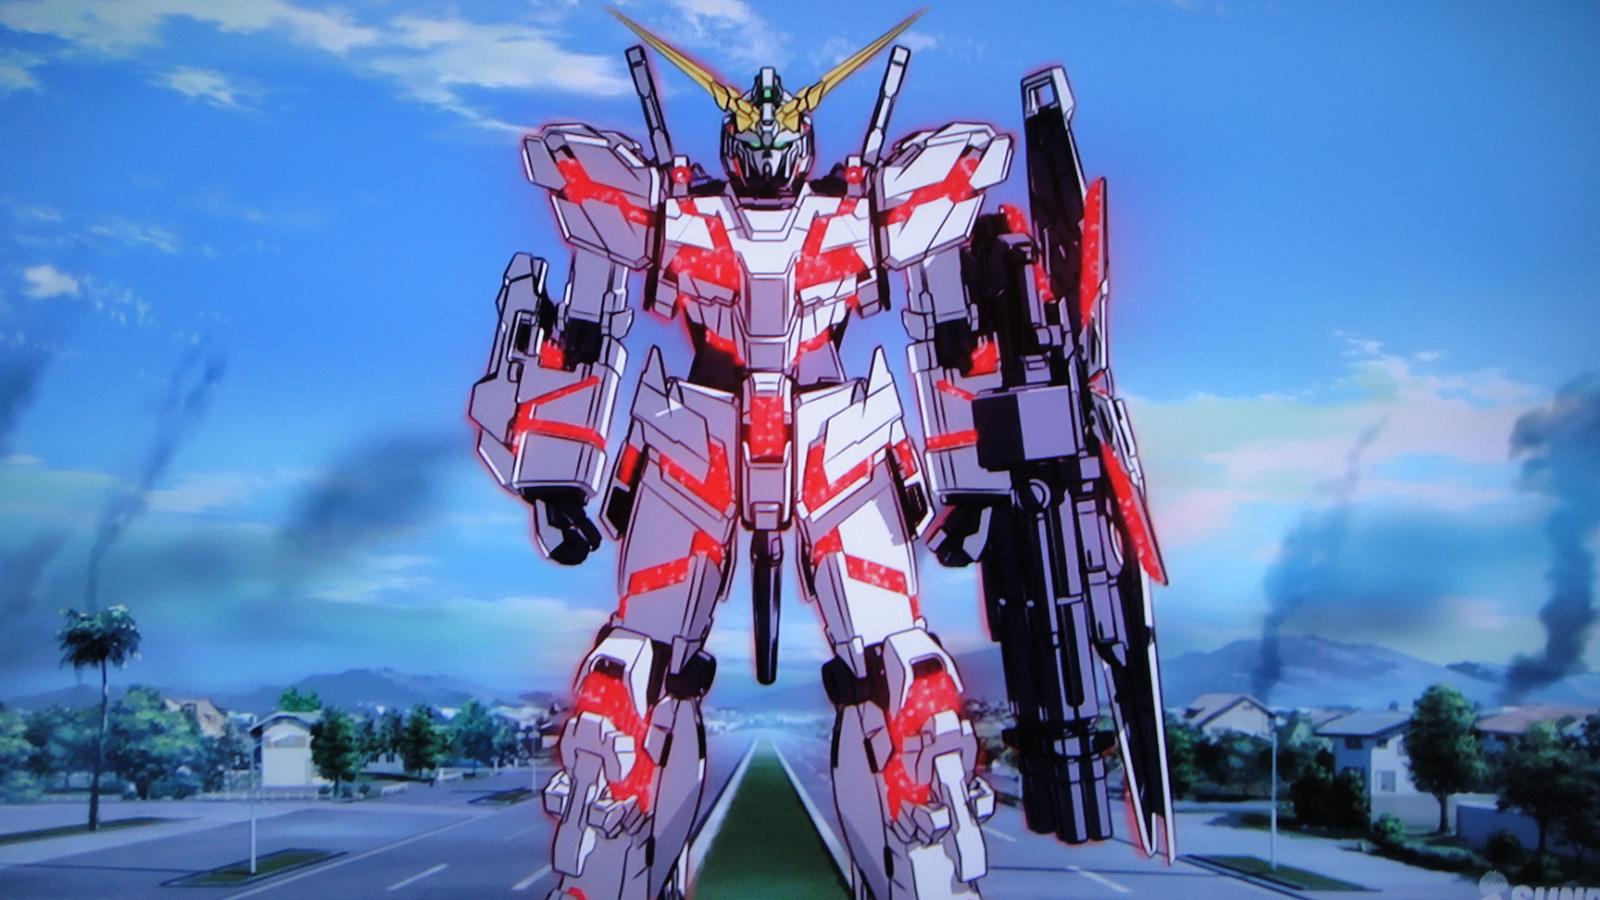 Mobile Suit Gundam Unicorn 11 Cool Hd Wallpaper - Animewp.com